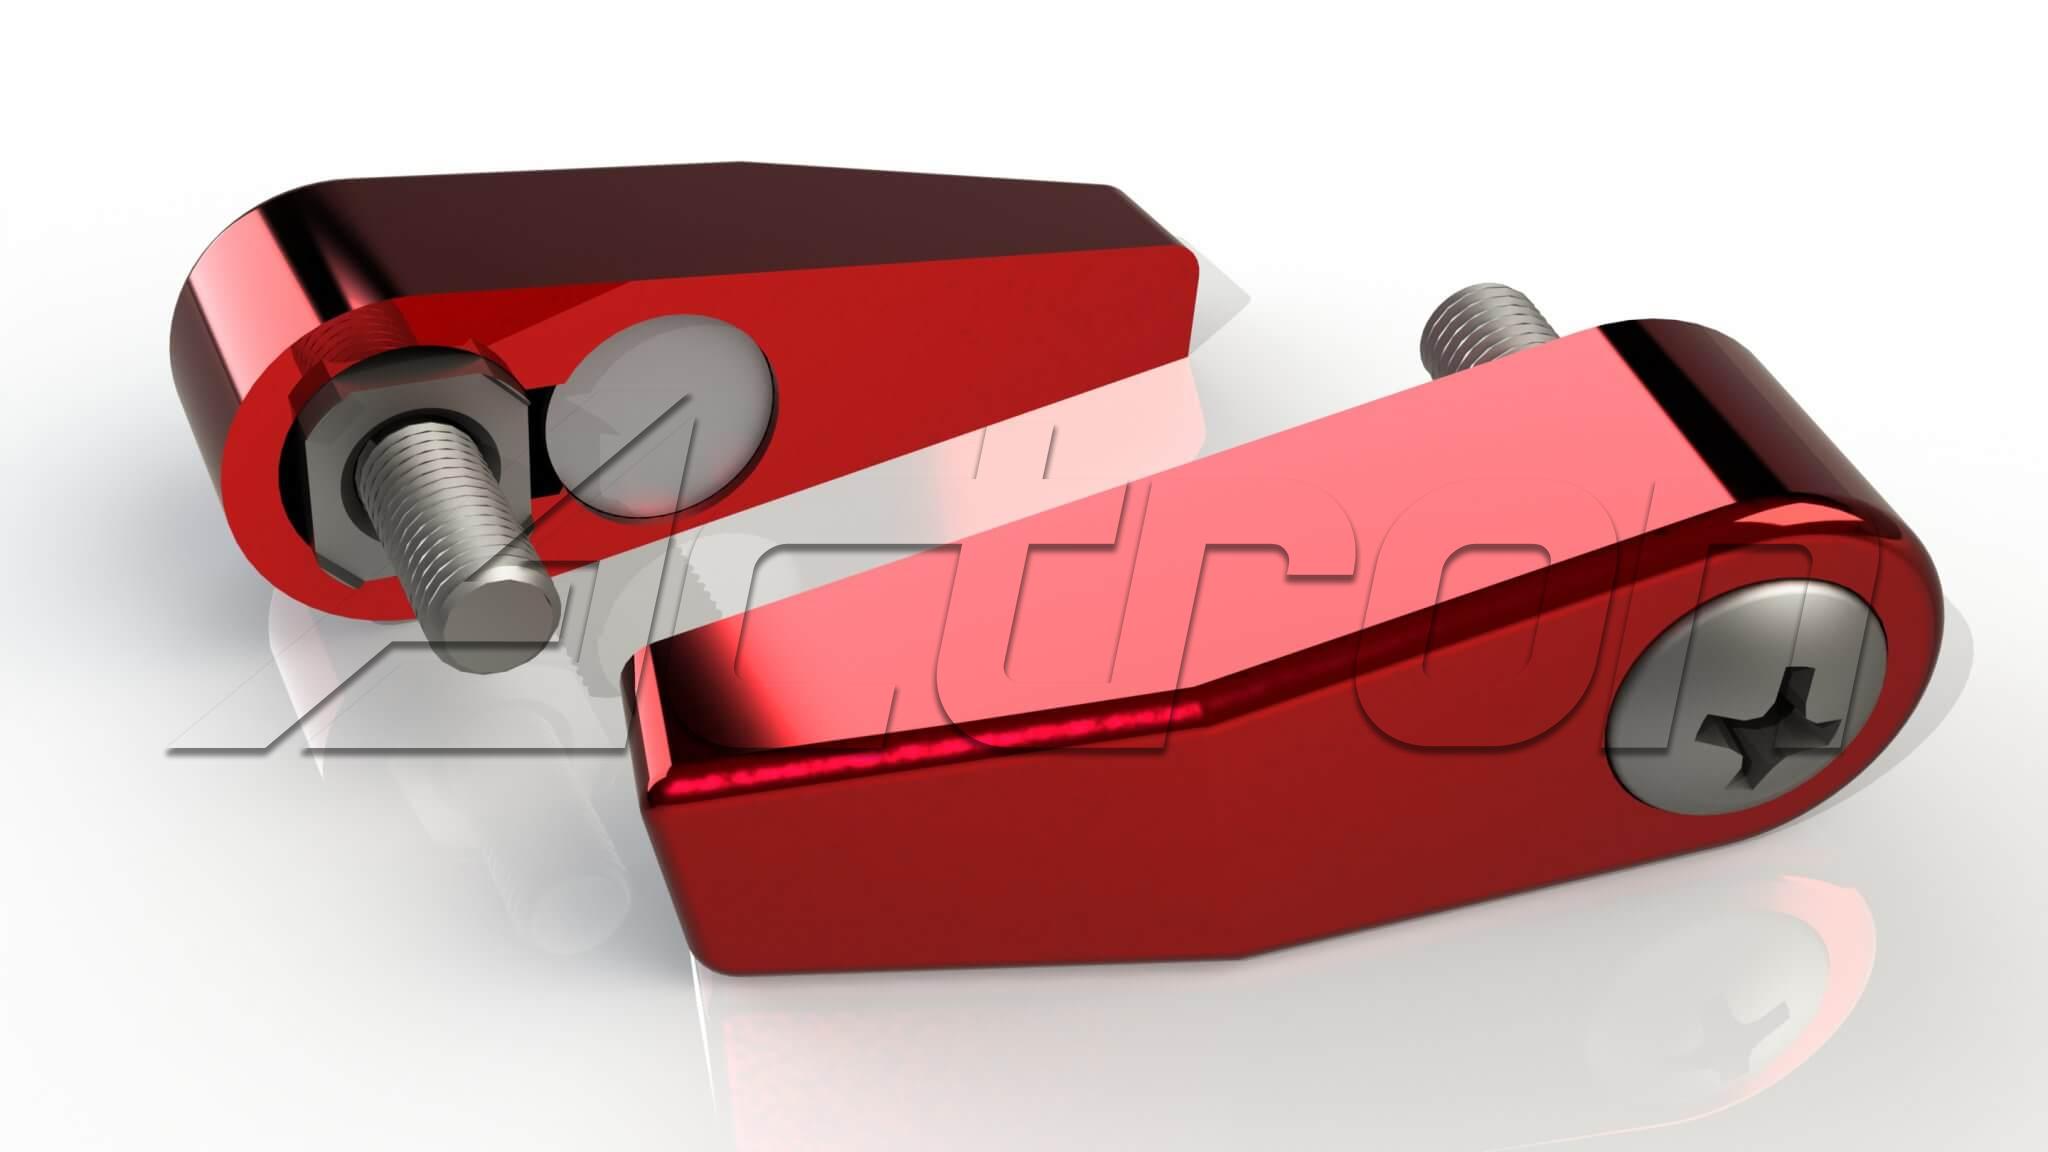 1-4-turn-retainer-4777-a35553.jpg